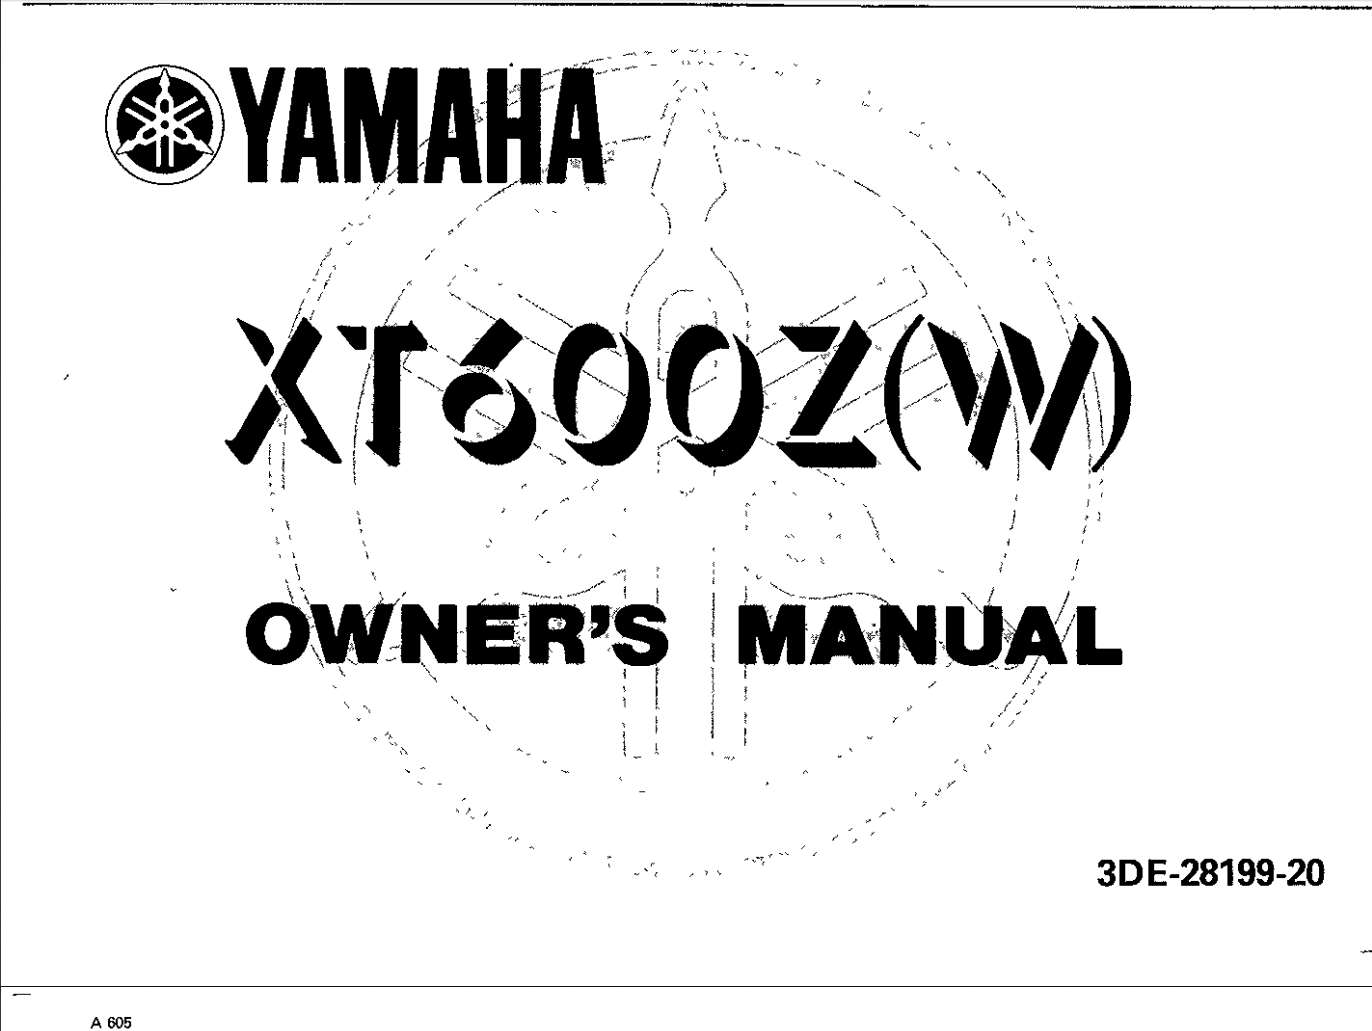 Yamaha XT600 W 1989 Owner's Manual